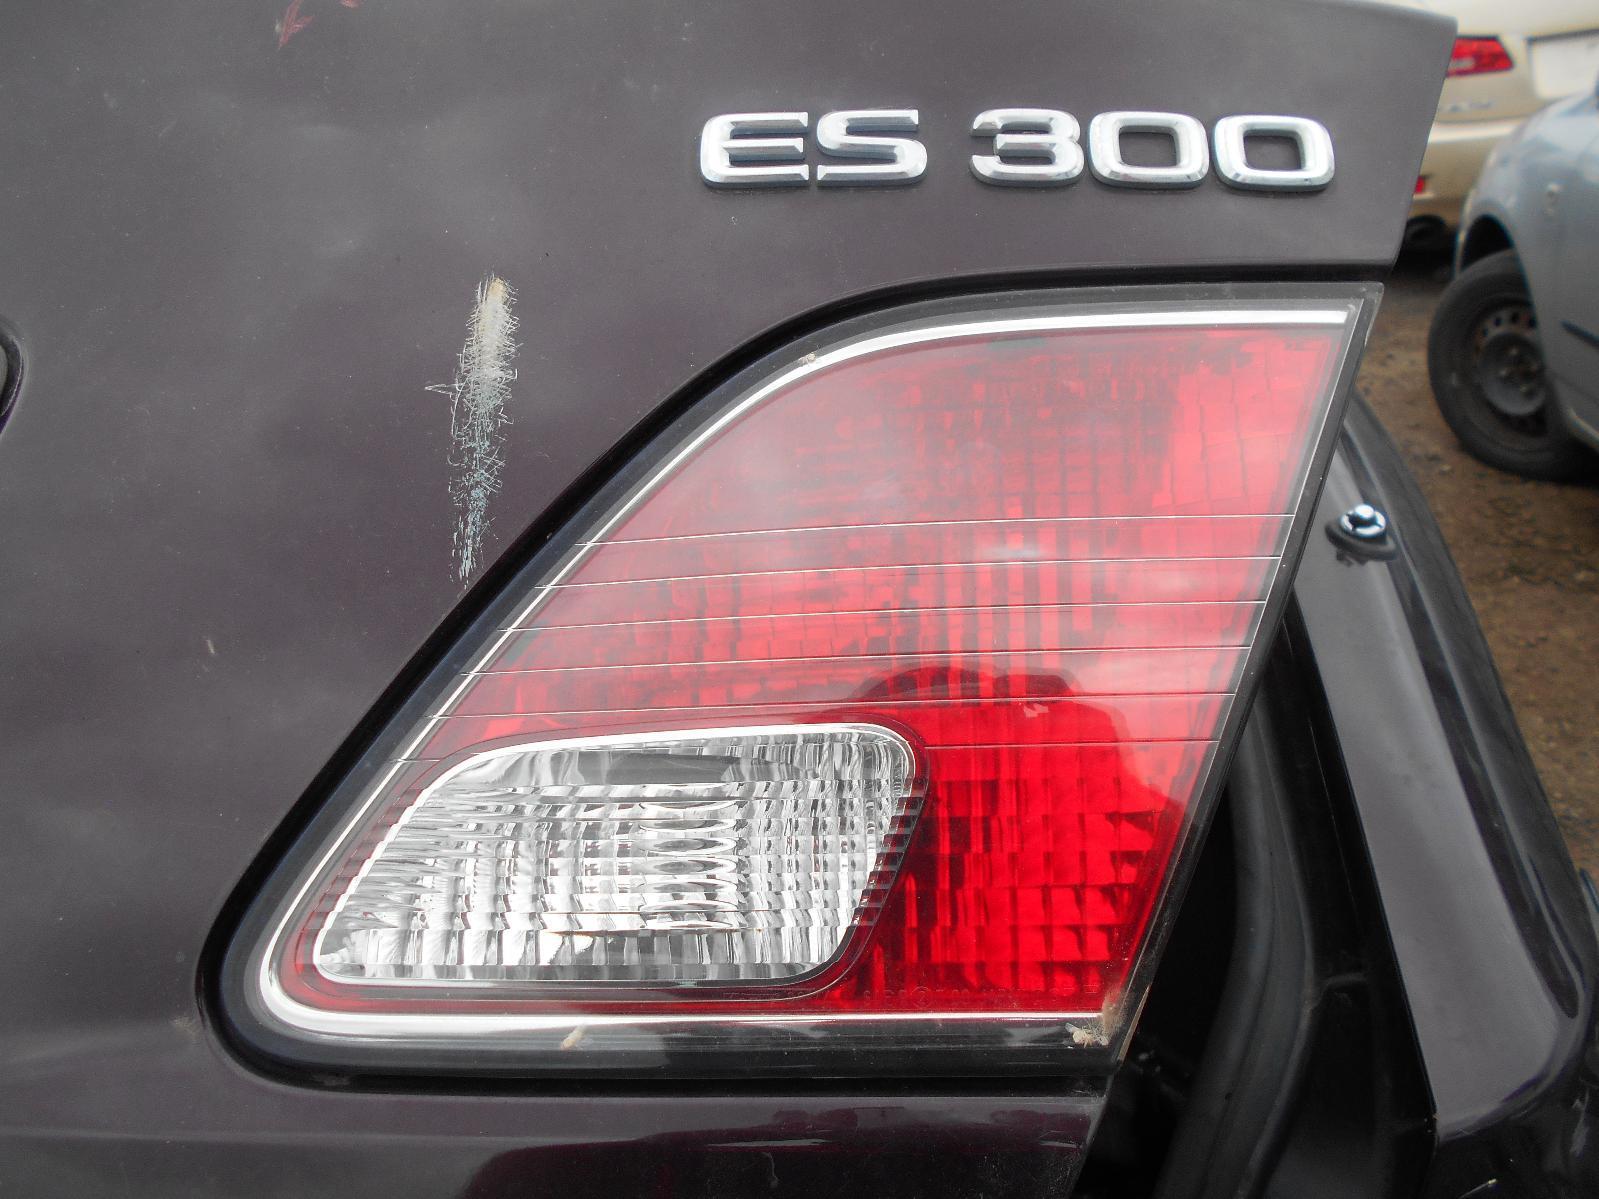 LEXUS ES300 (92-05), Rear Garnish, BOOTLID LAMP (RH SIDE), VCV10, 10/01-12/05